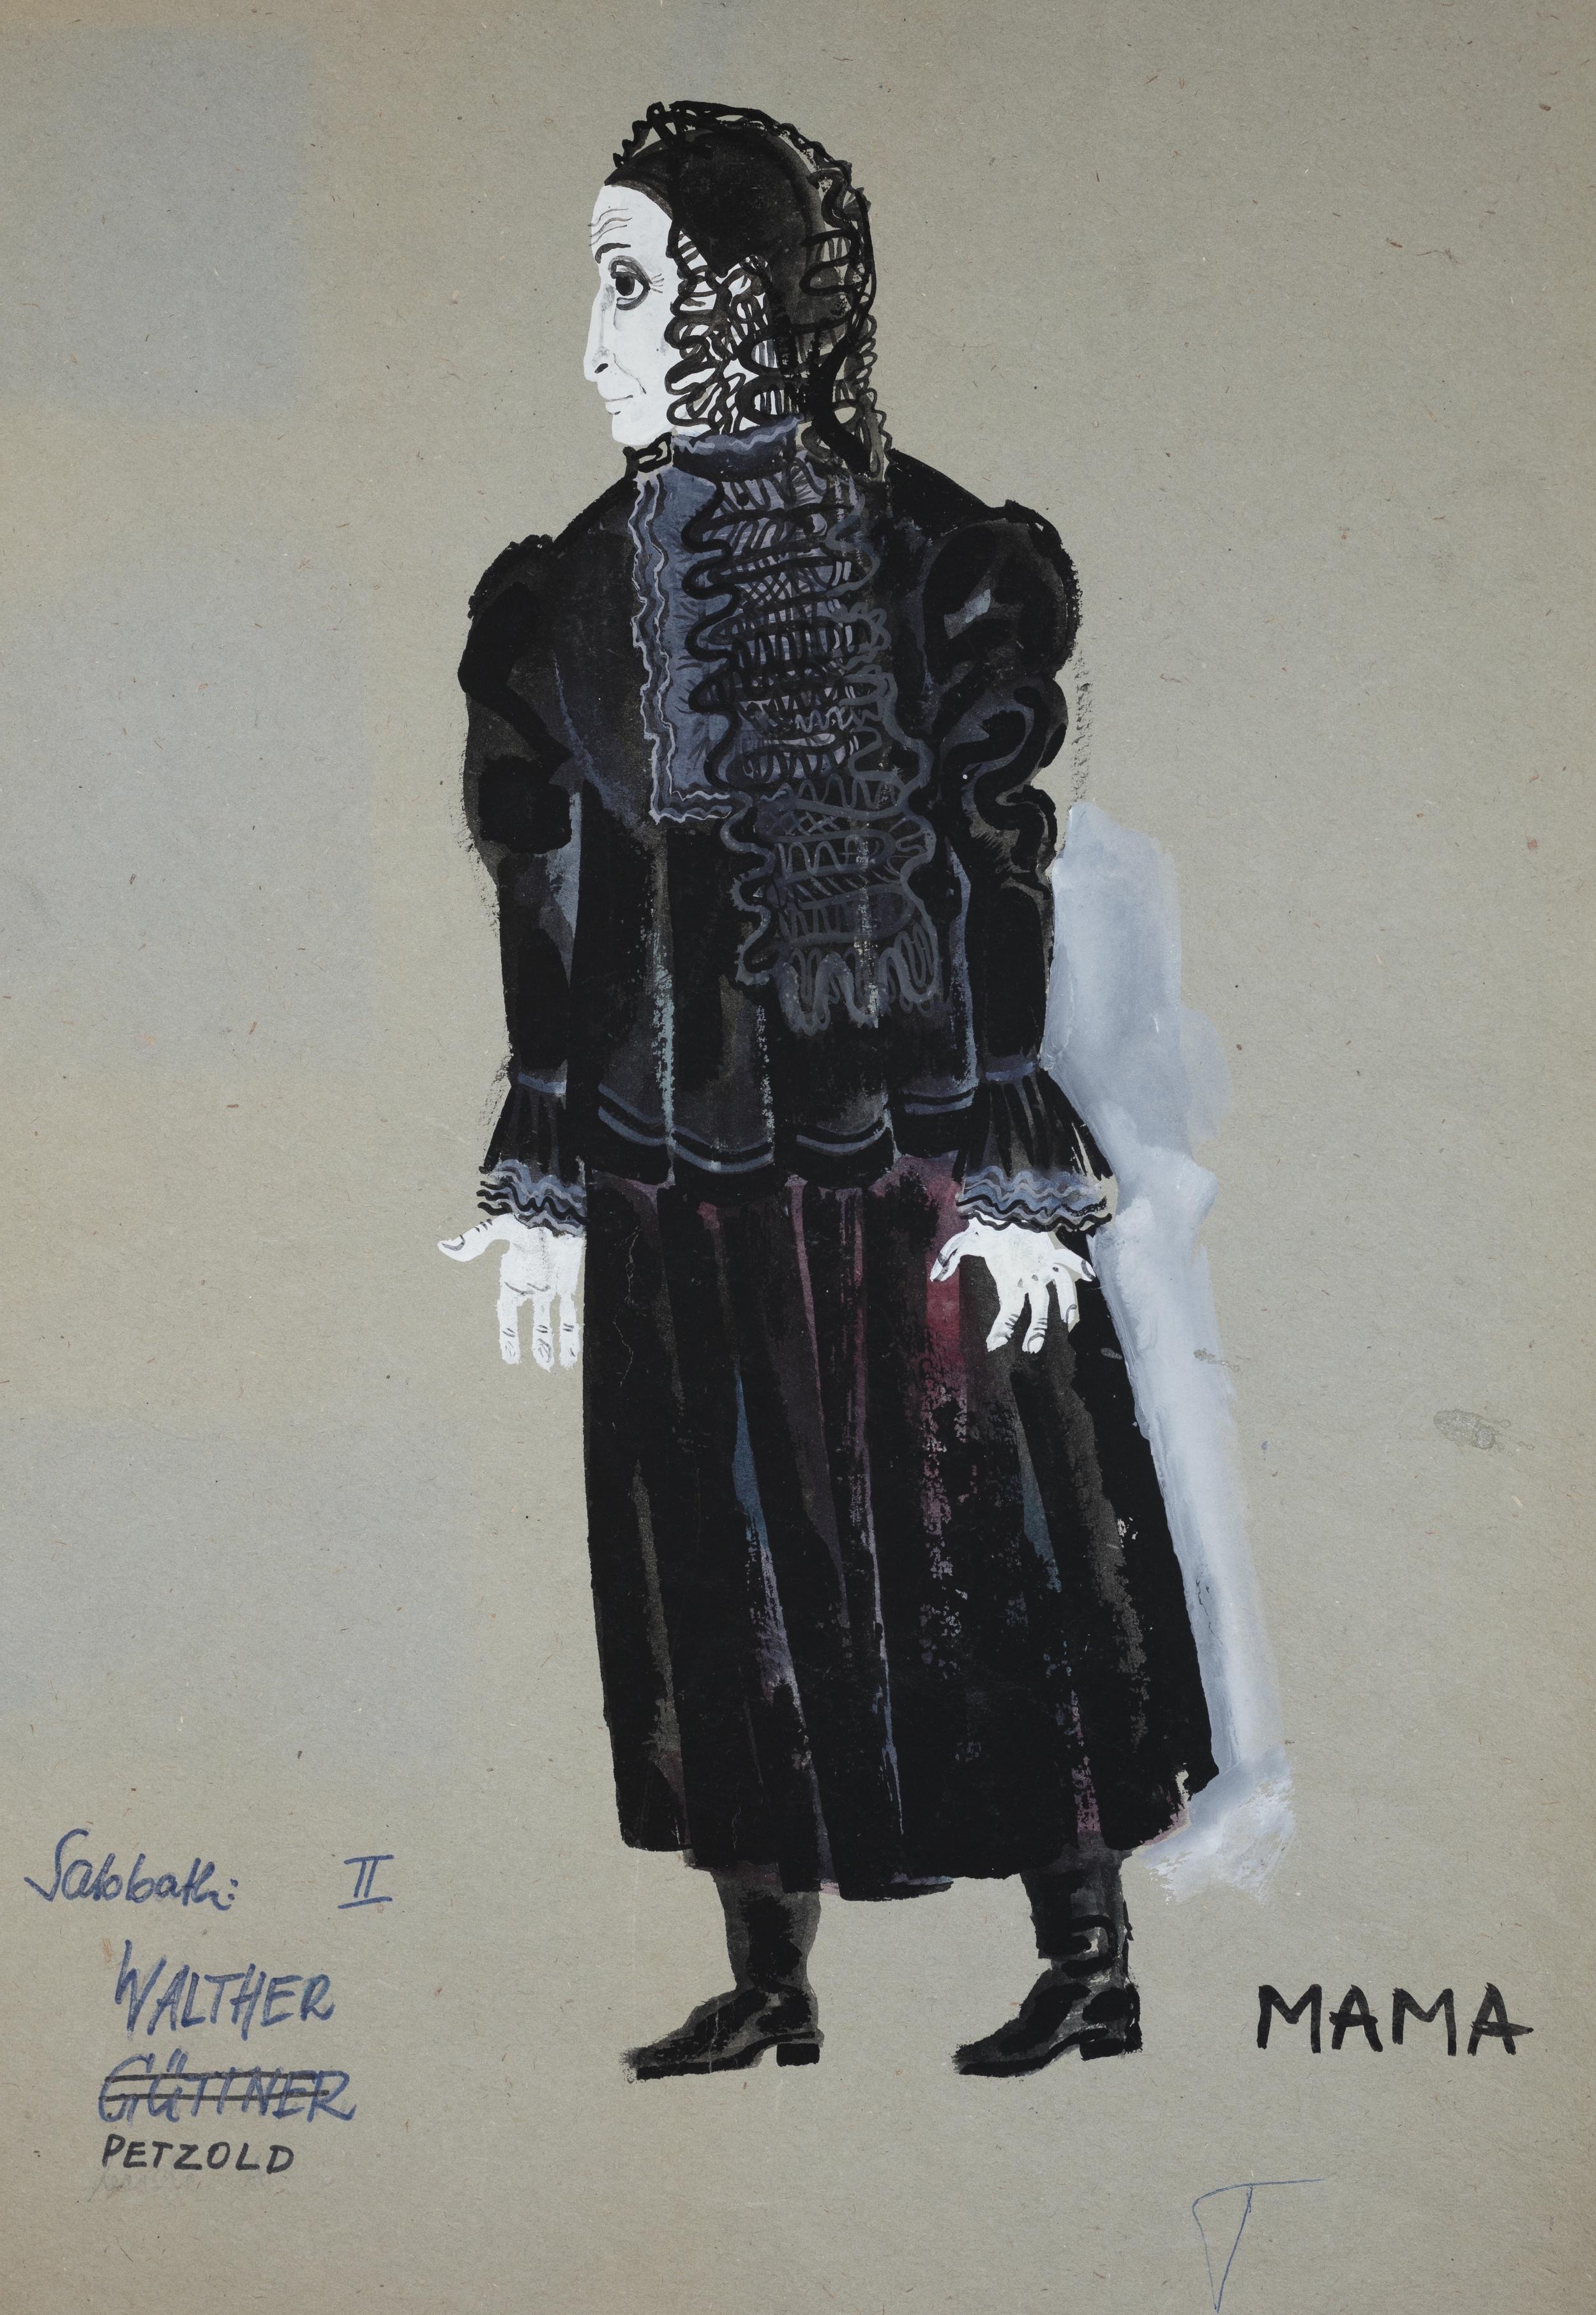 Fiddler on the Roof  by Jerry Bock . Costume design. Komishe Oper, Berlin 1971